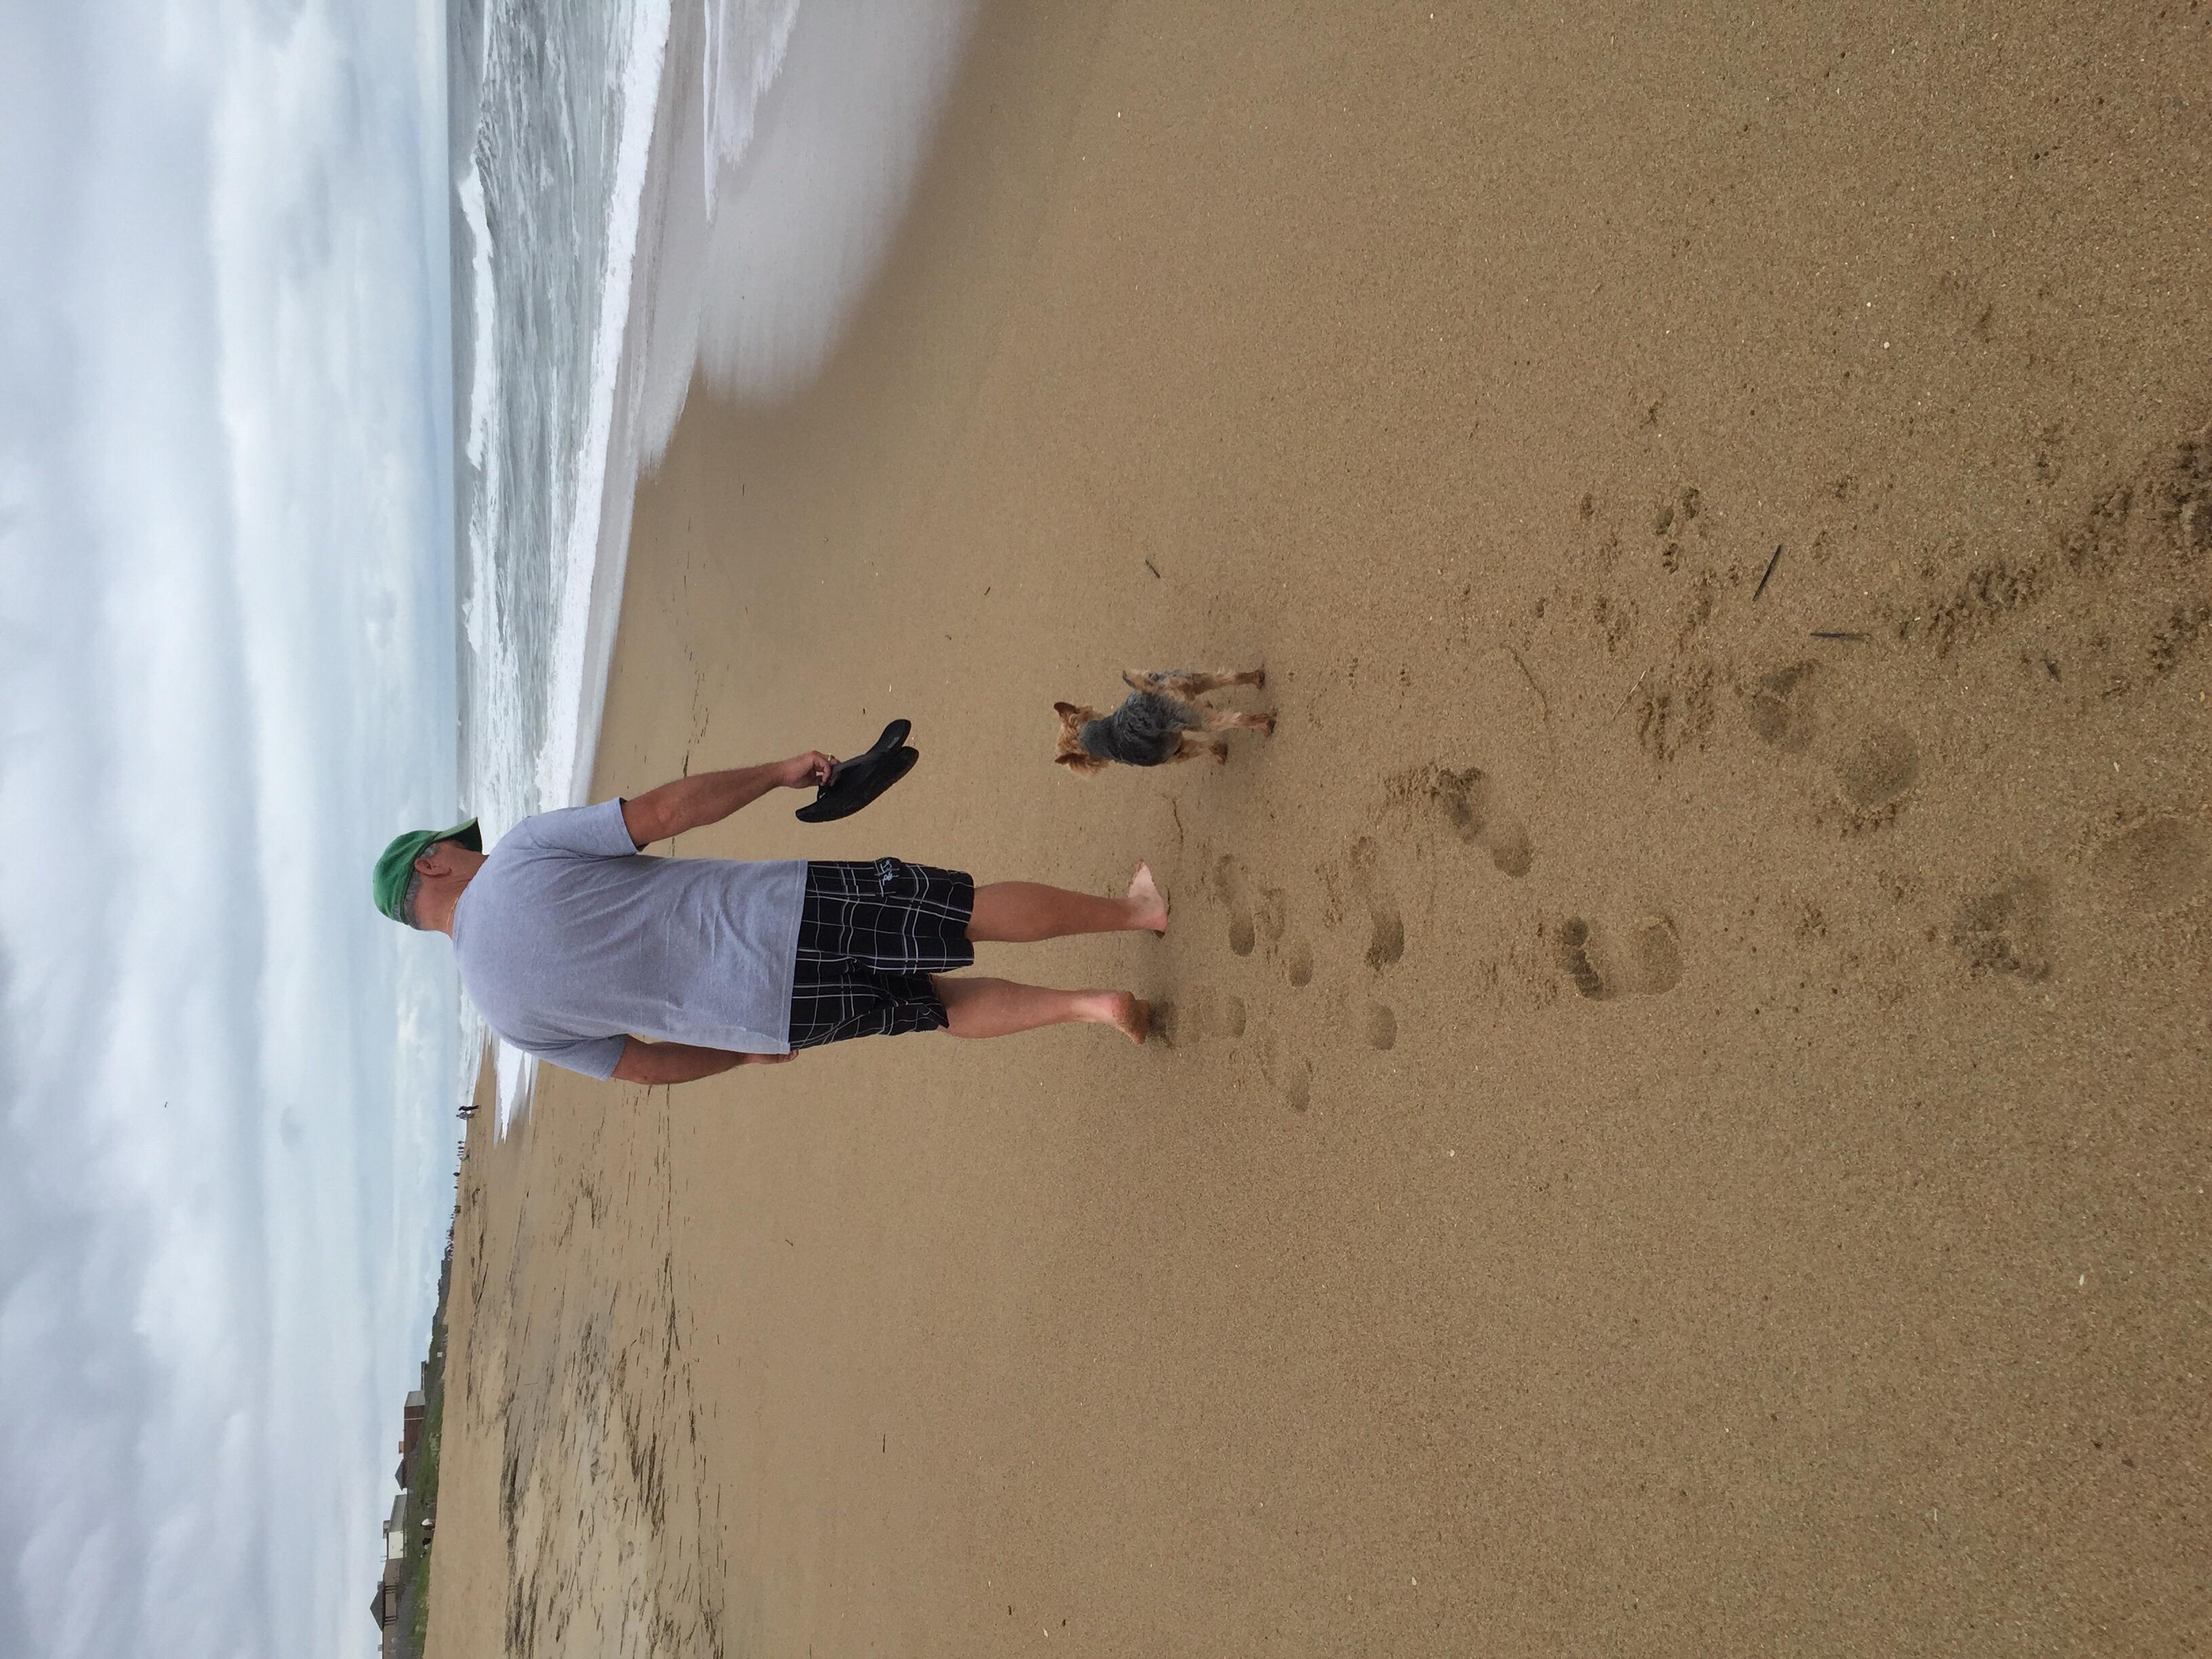 May 2016 Stay - KD13 - Surfin Gypsy (Formerly Pelican Cay), Bill Hoynack